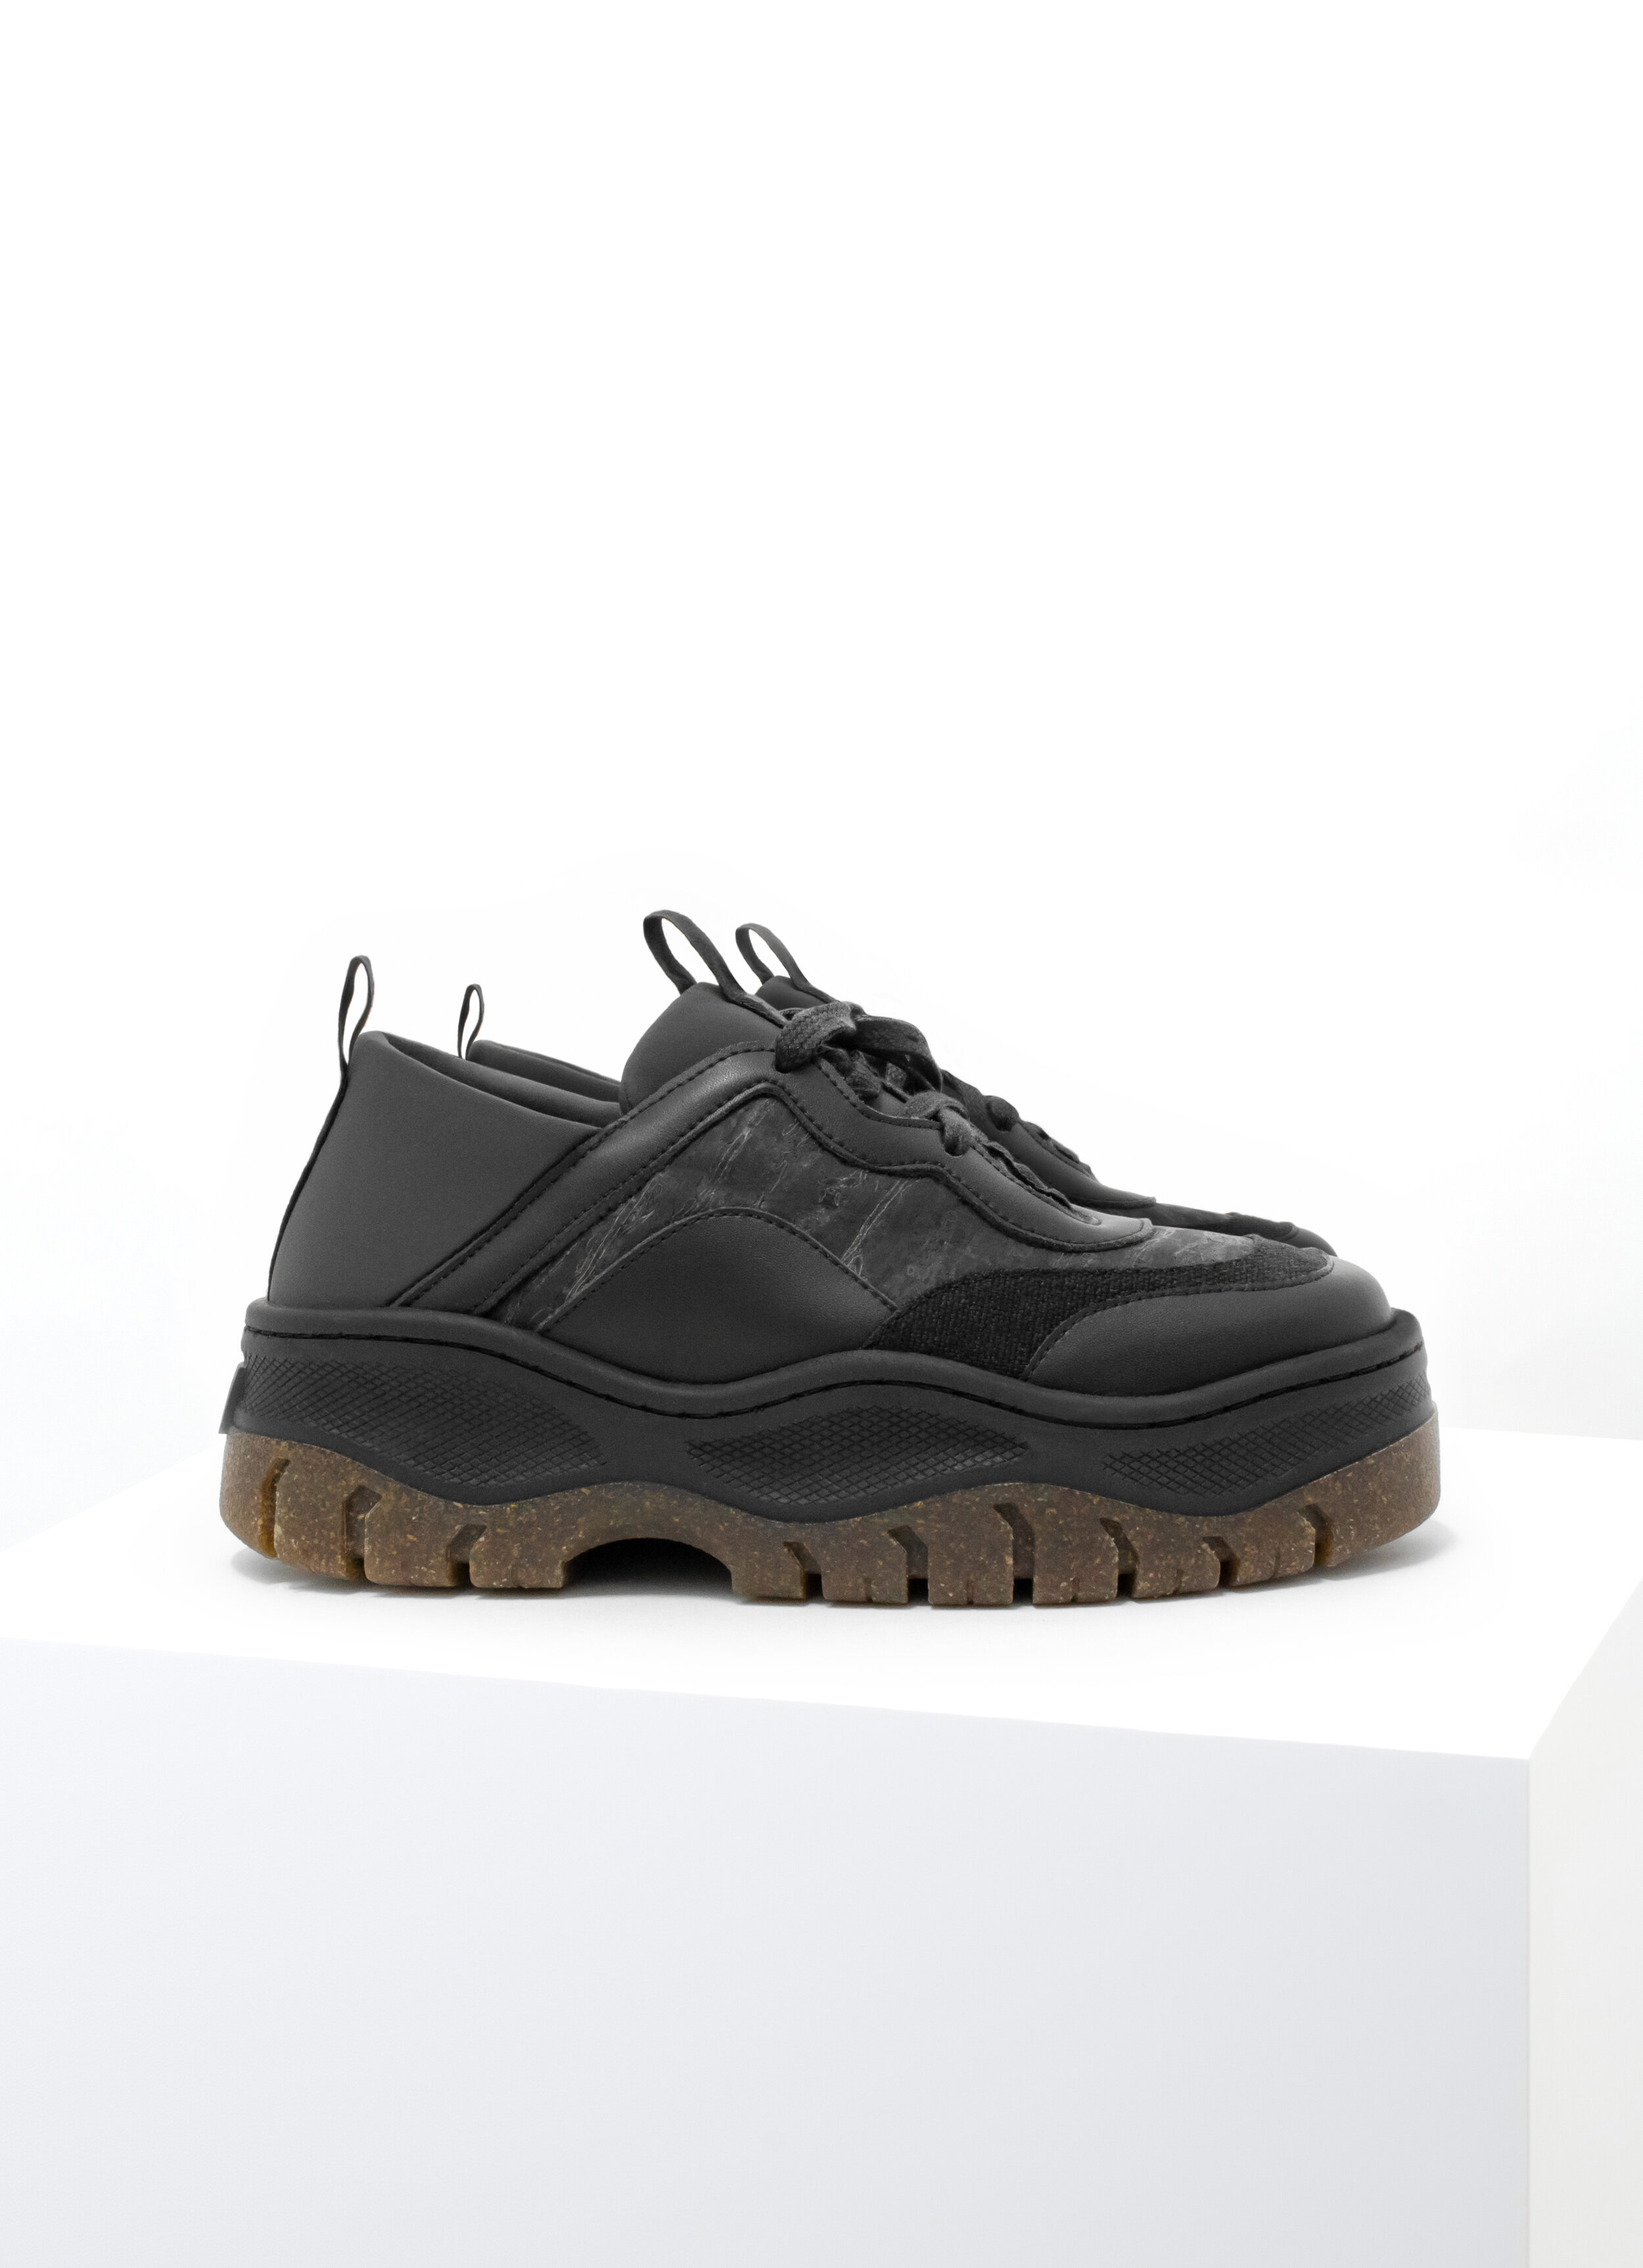 Rice Rave Sneaker Black.jpg